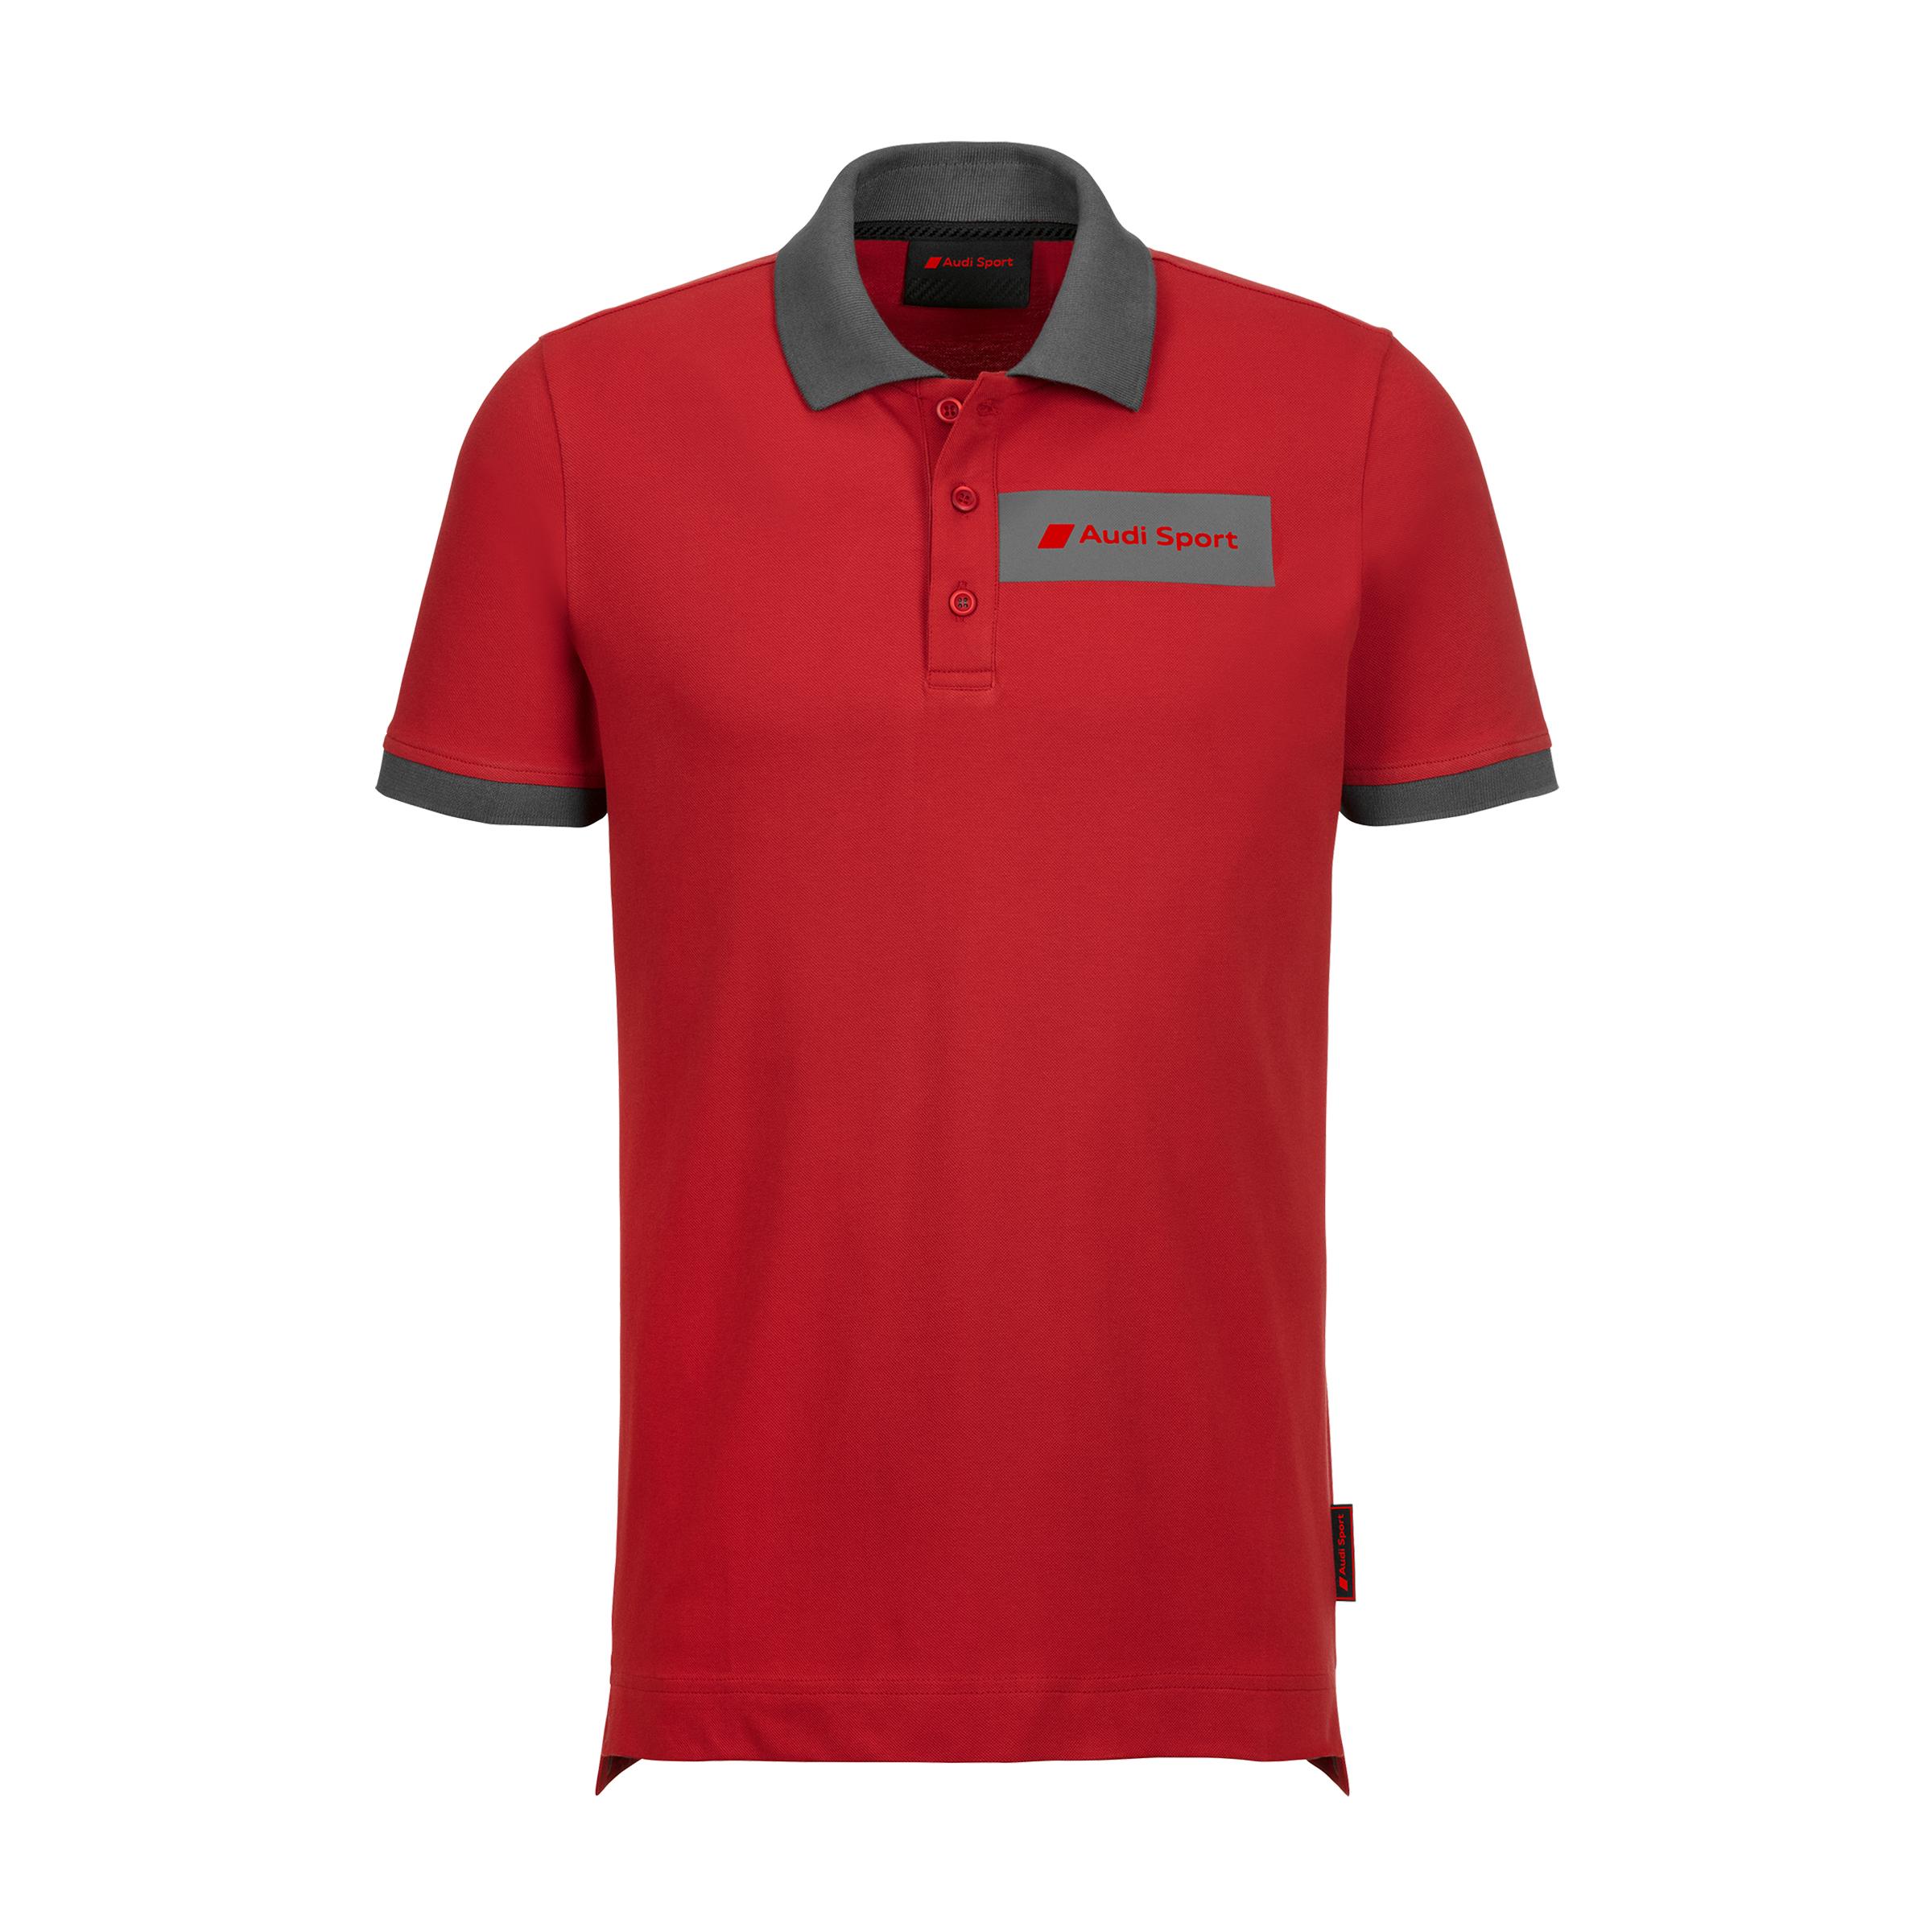 Audi Sport Poloshirt Herren Größe S rot